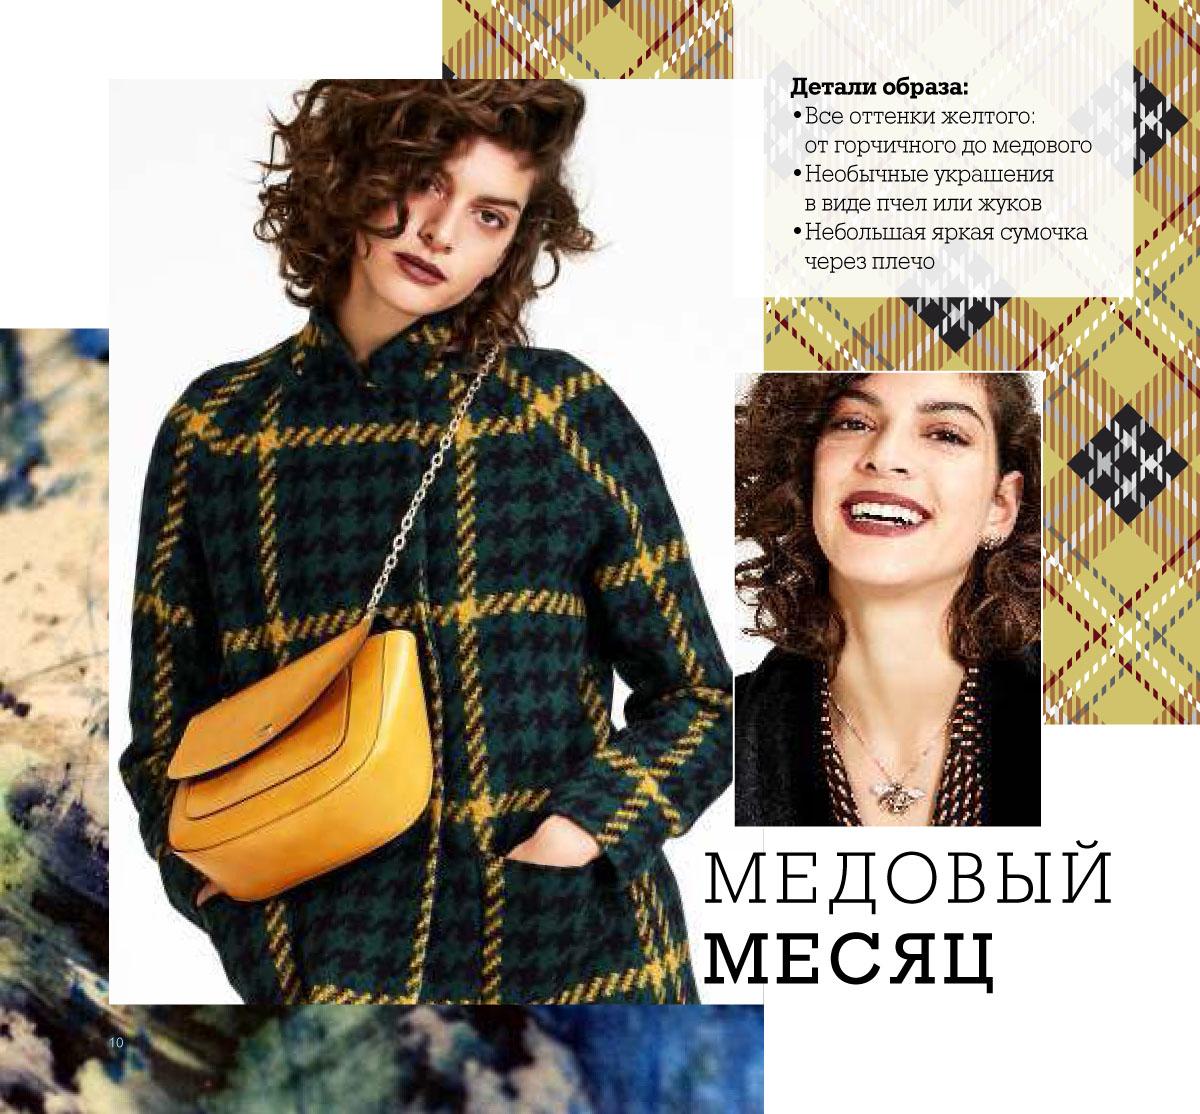 Вкладыш (мини-каталог) в каталог Орифлейм 12 2018 года, Россия